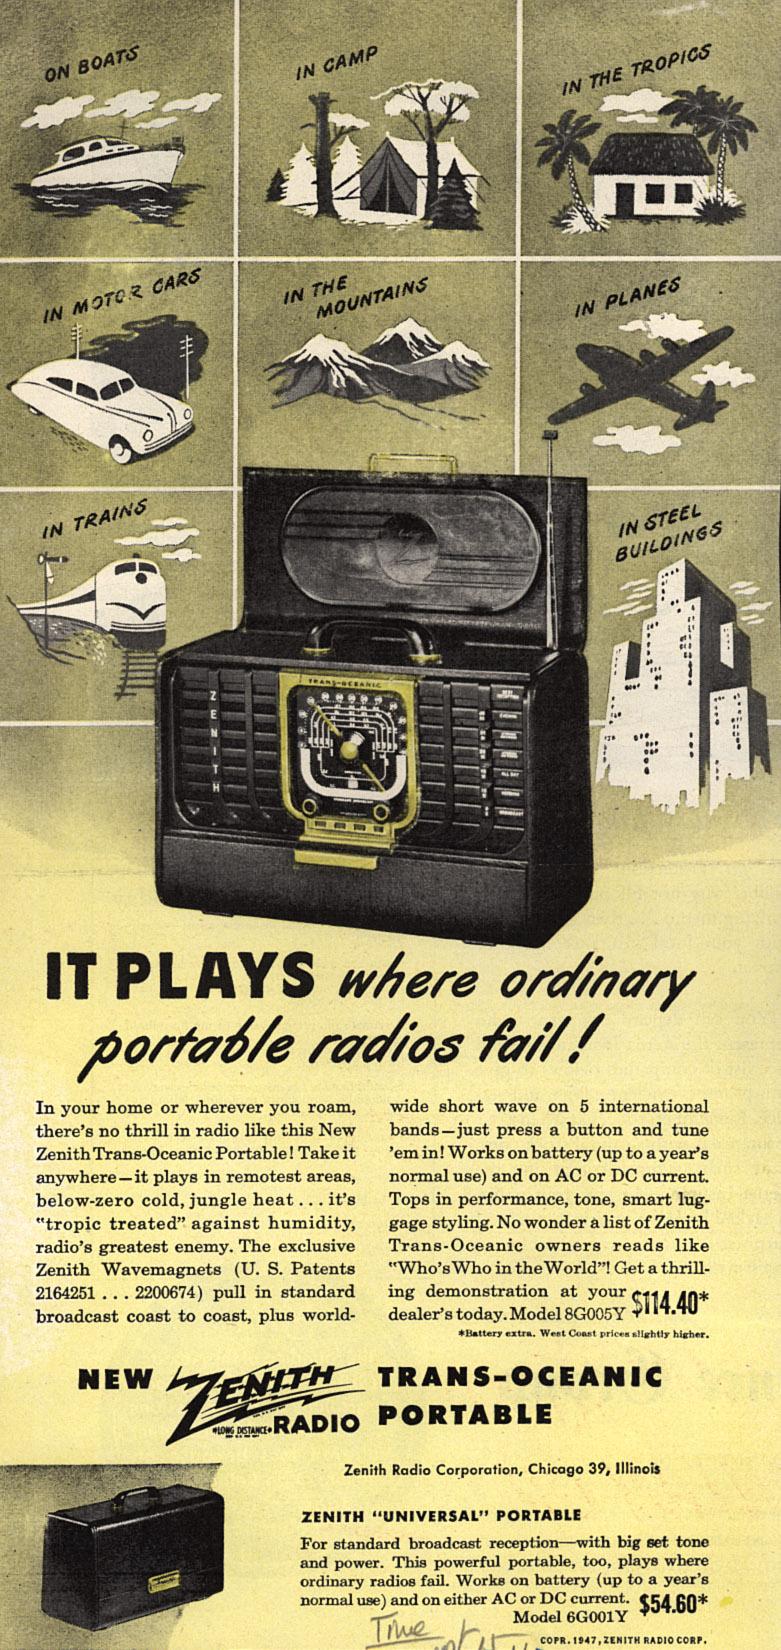 It_plays_where_ordinary_portable_radios_fail